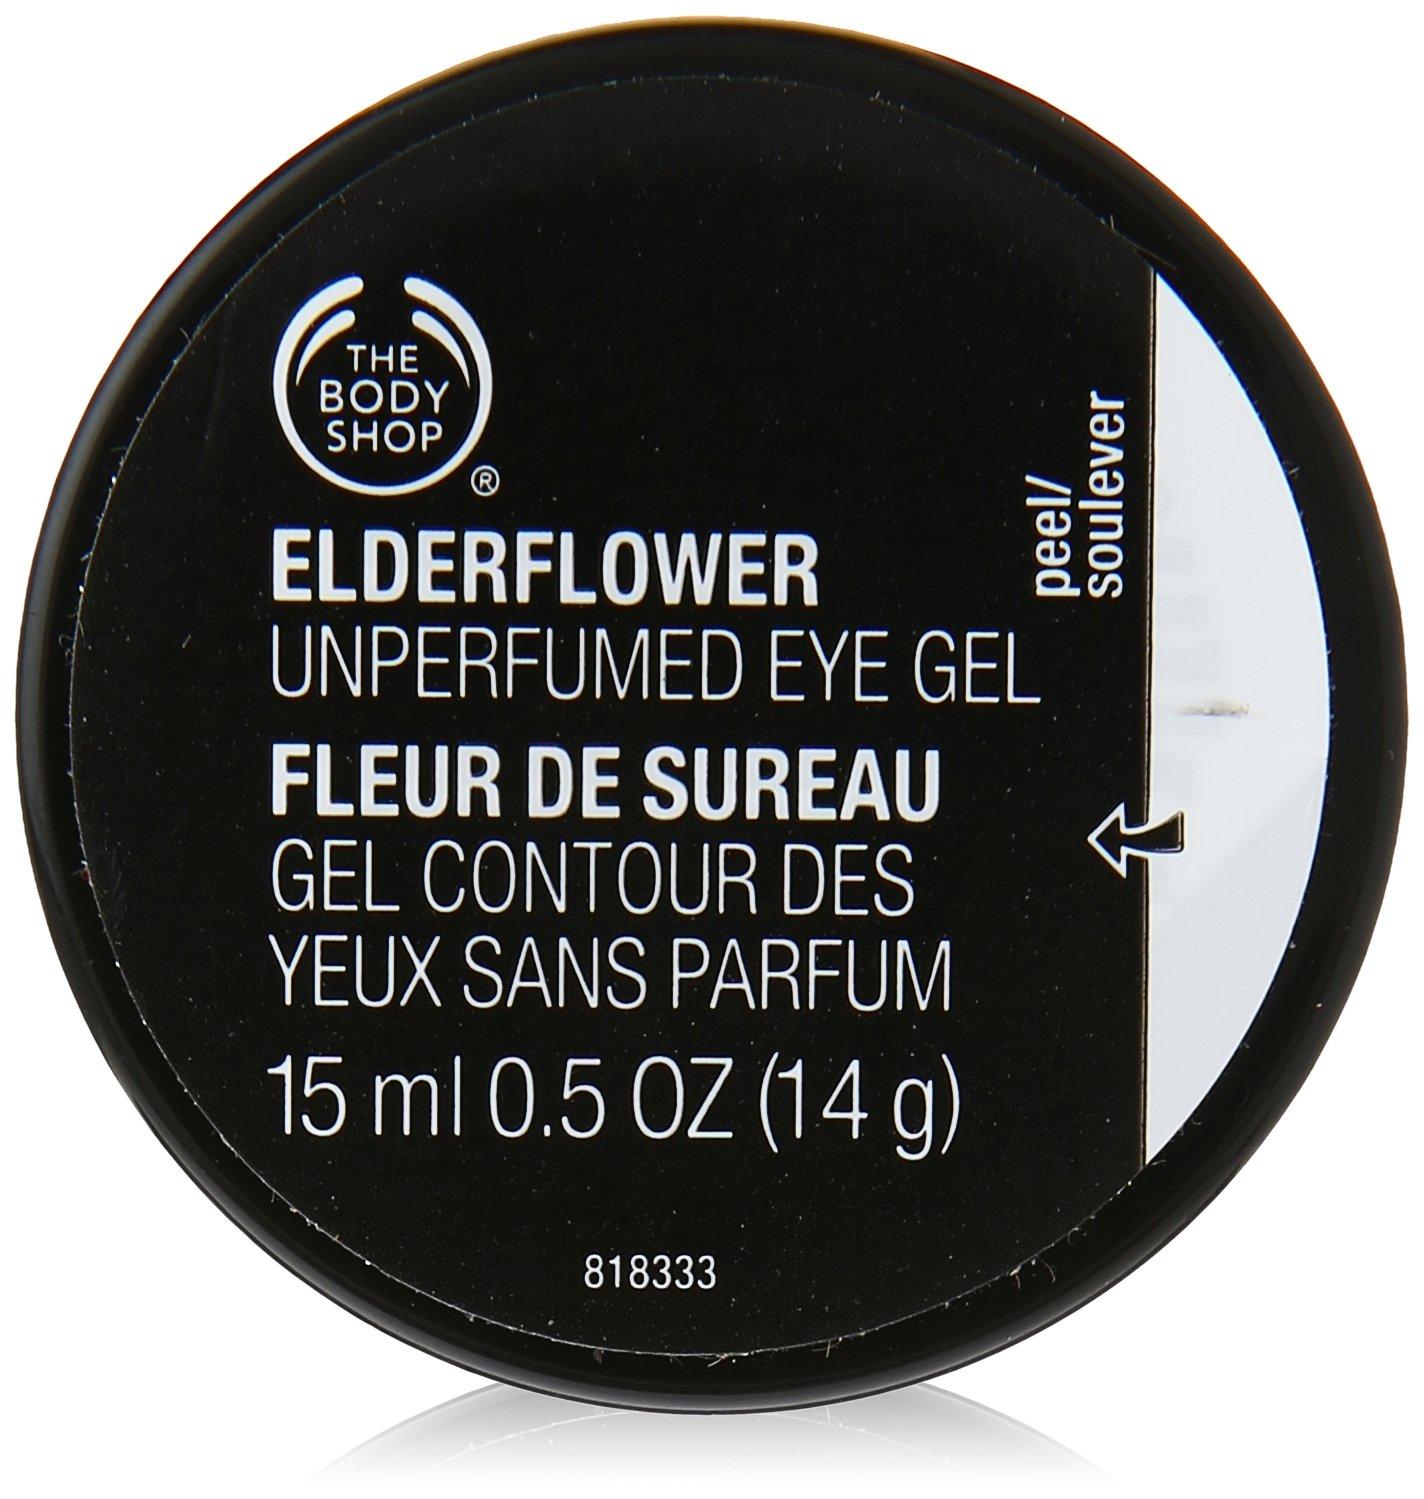 The Body Shop Elderflower Cooling Eye Gel, 0.5 Fl Oz by The Body Shop